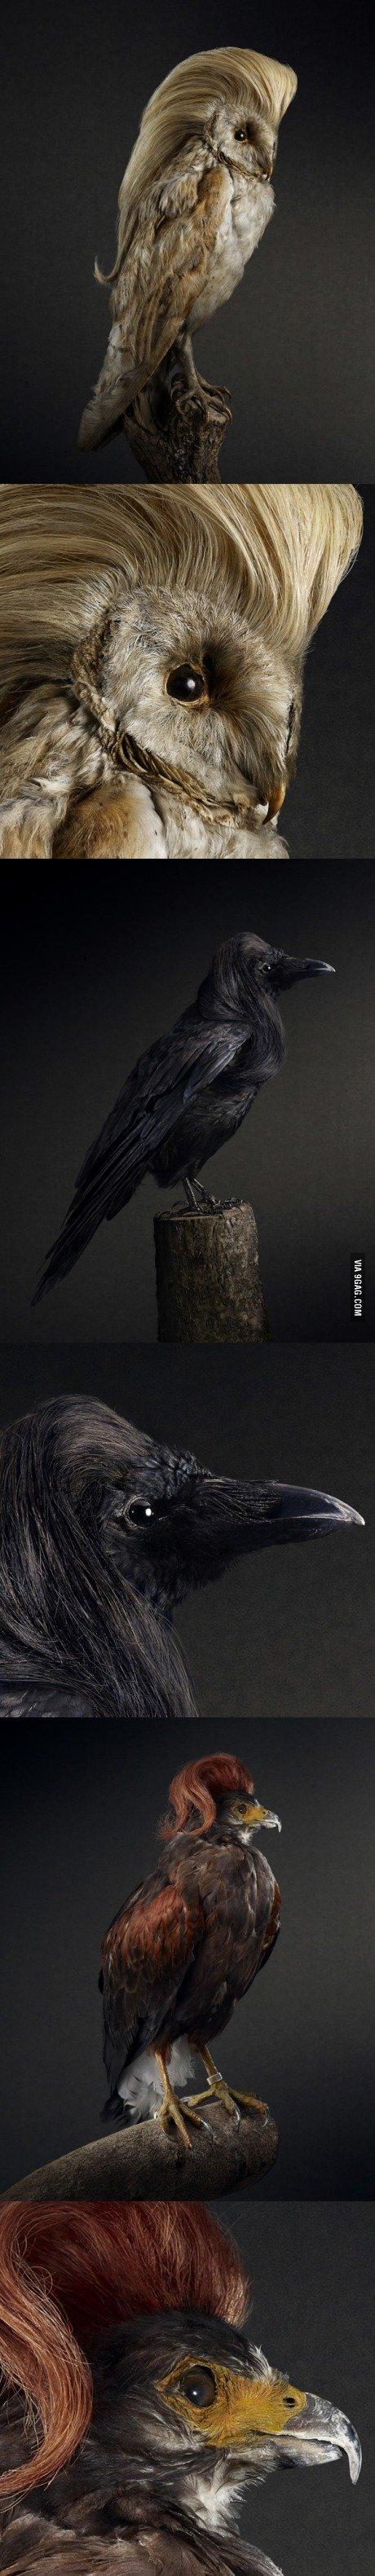 Birds with amazing hair.. . Birds with amazing hair